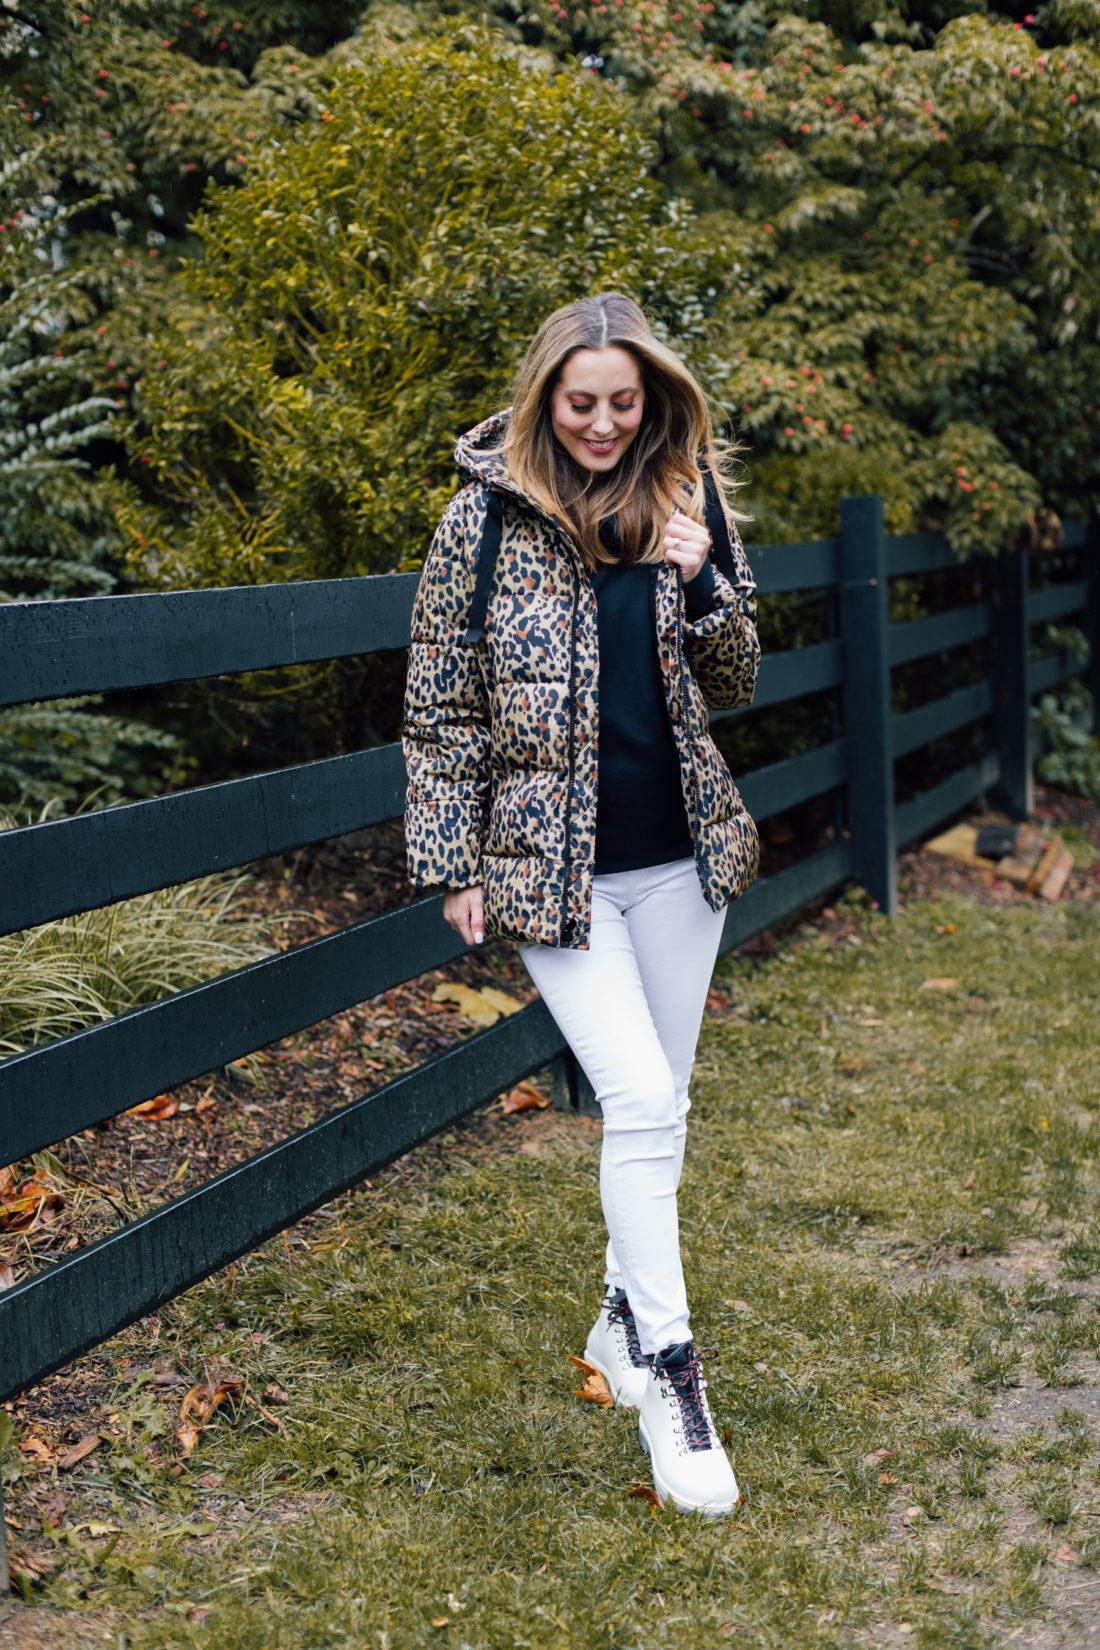 Eva Amurri Martino wears an inexpensive leopard print winter coat from the Gap